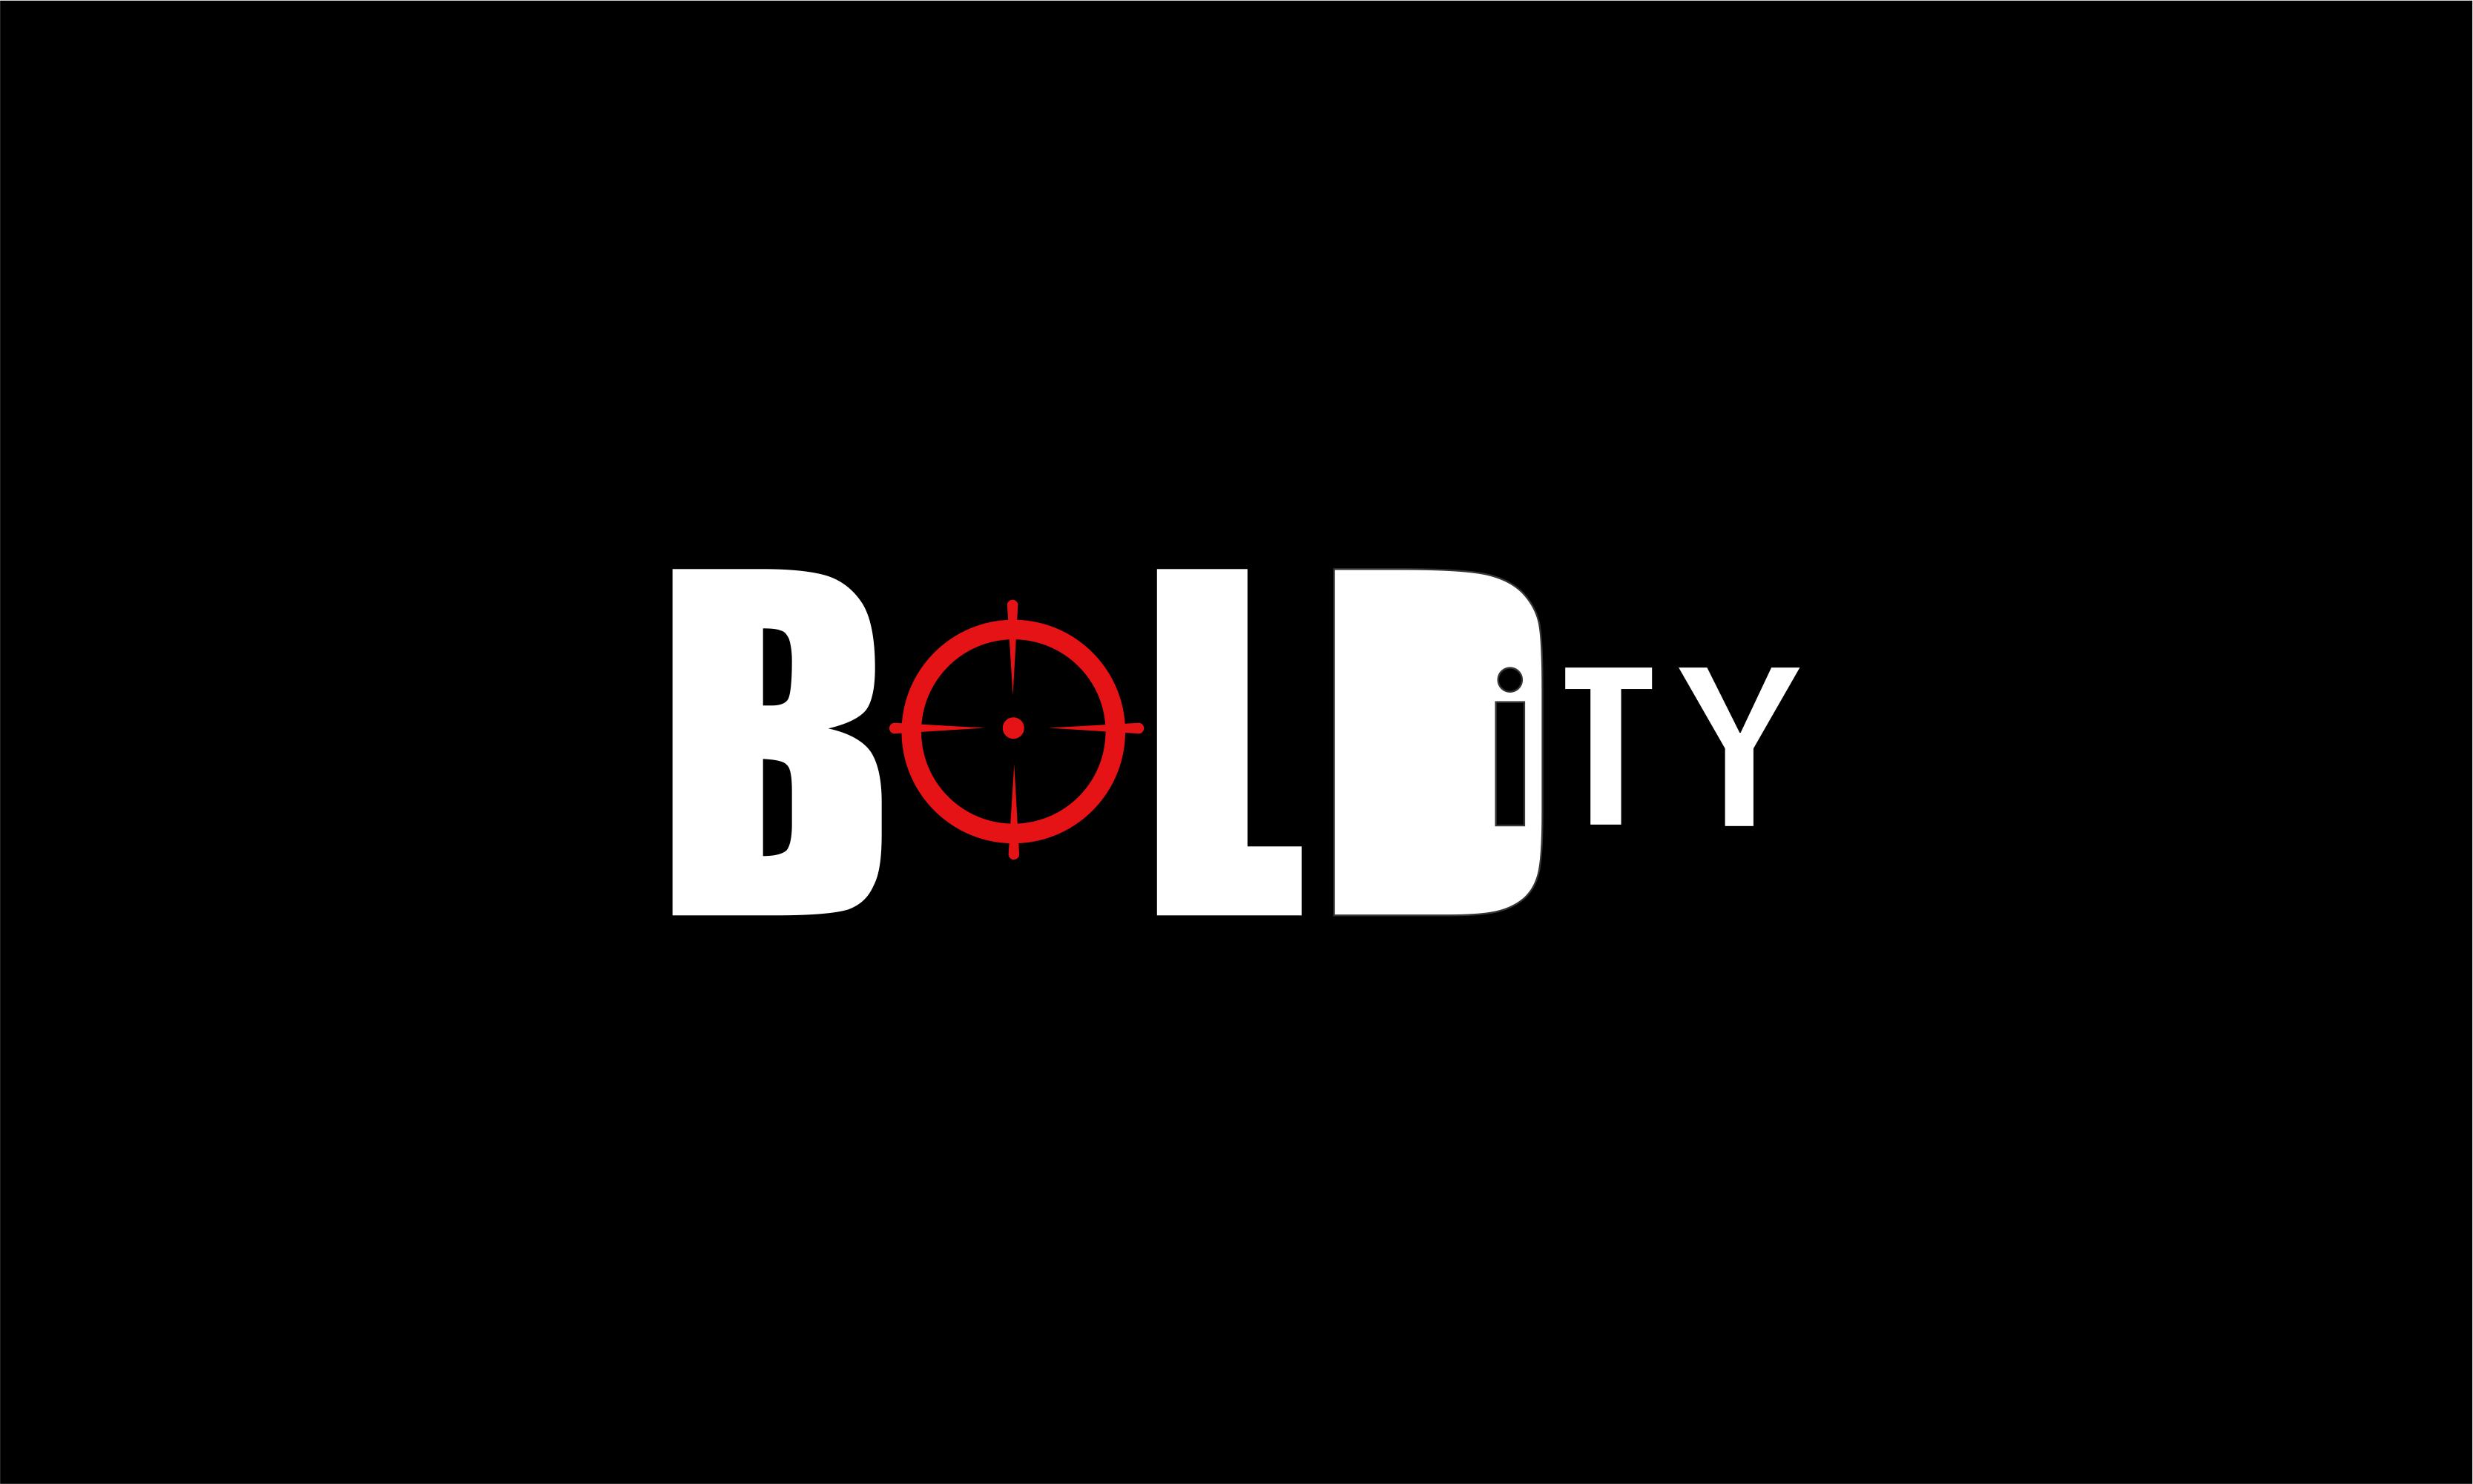 Boldity